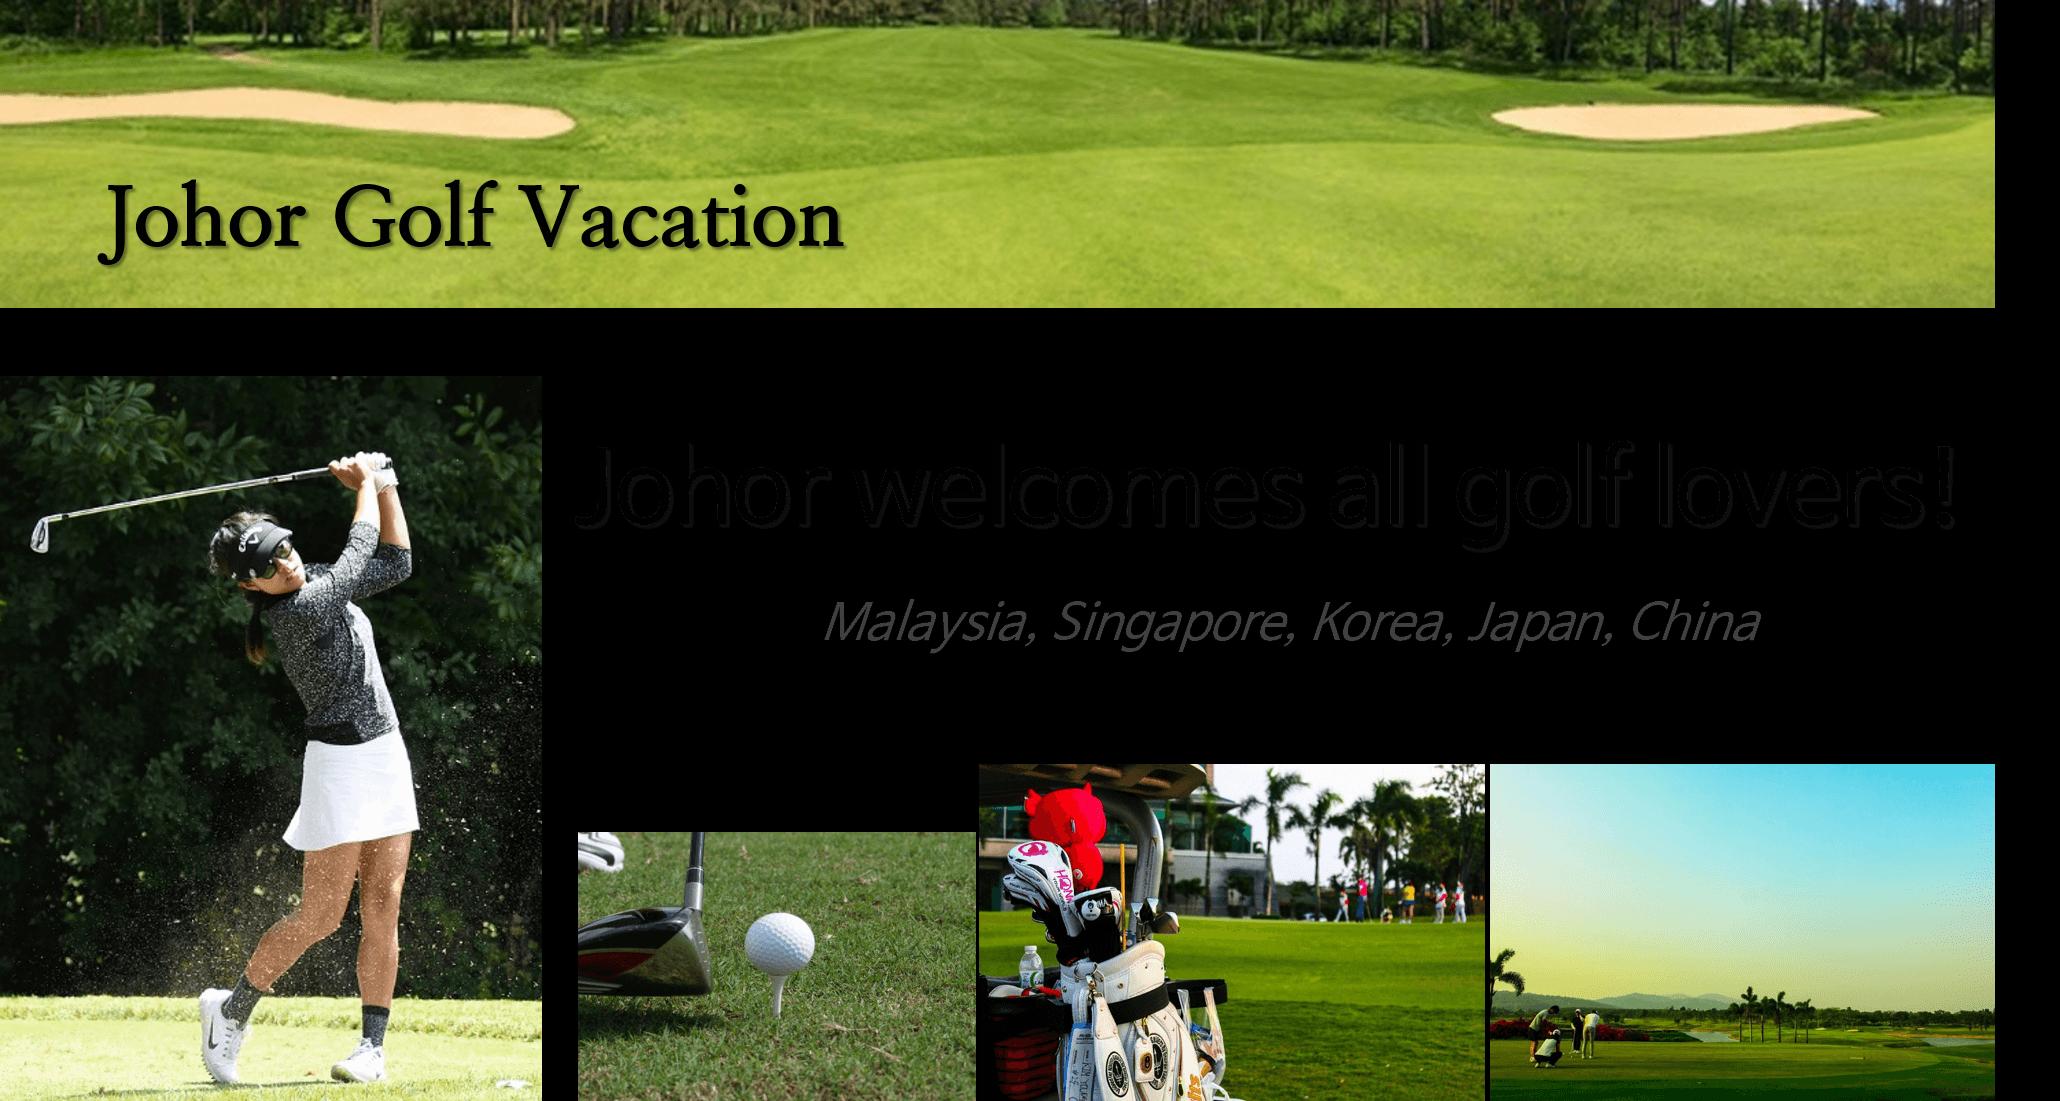 johor golf vacation 2